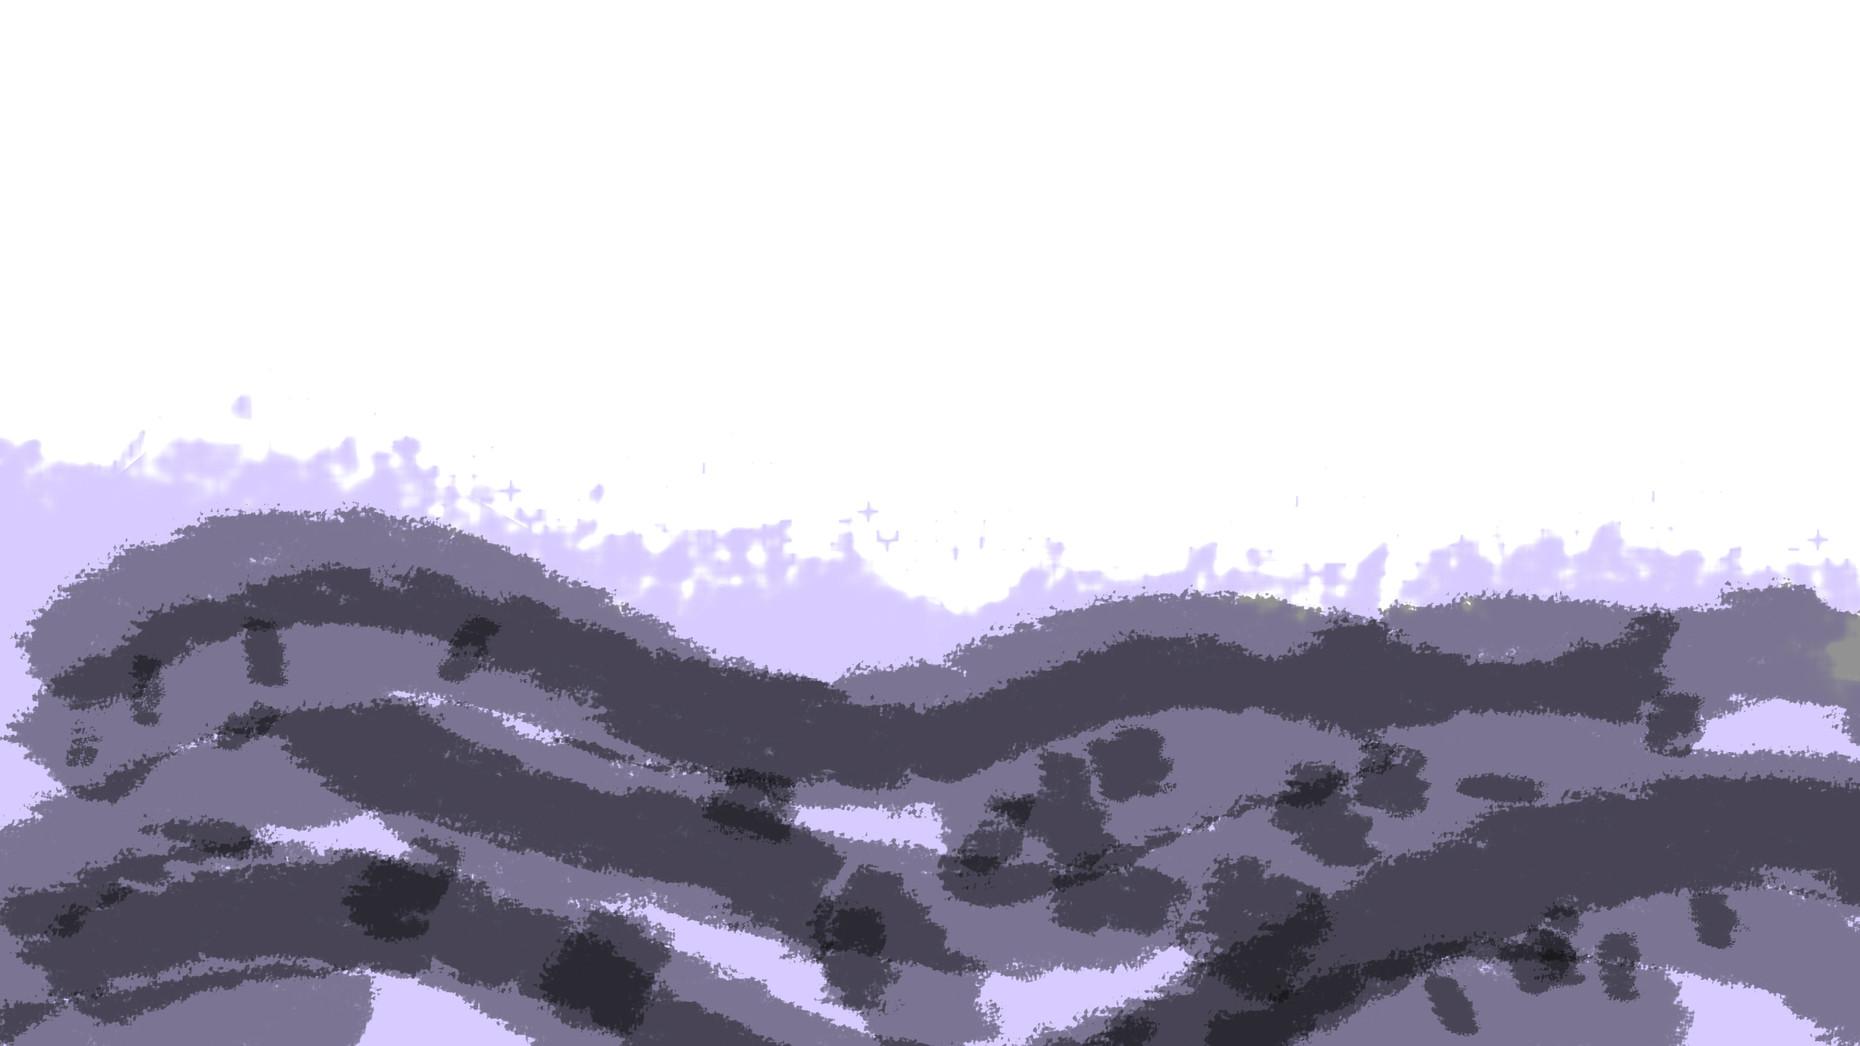 Pool_crayon1.jpg